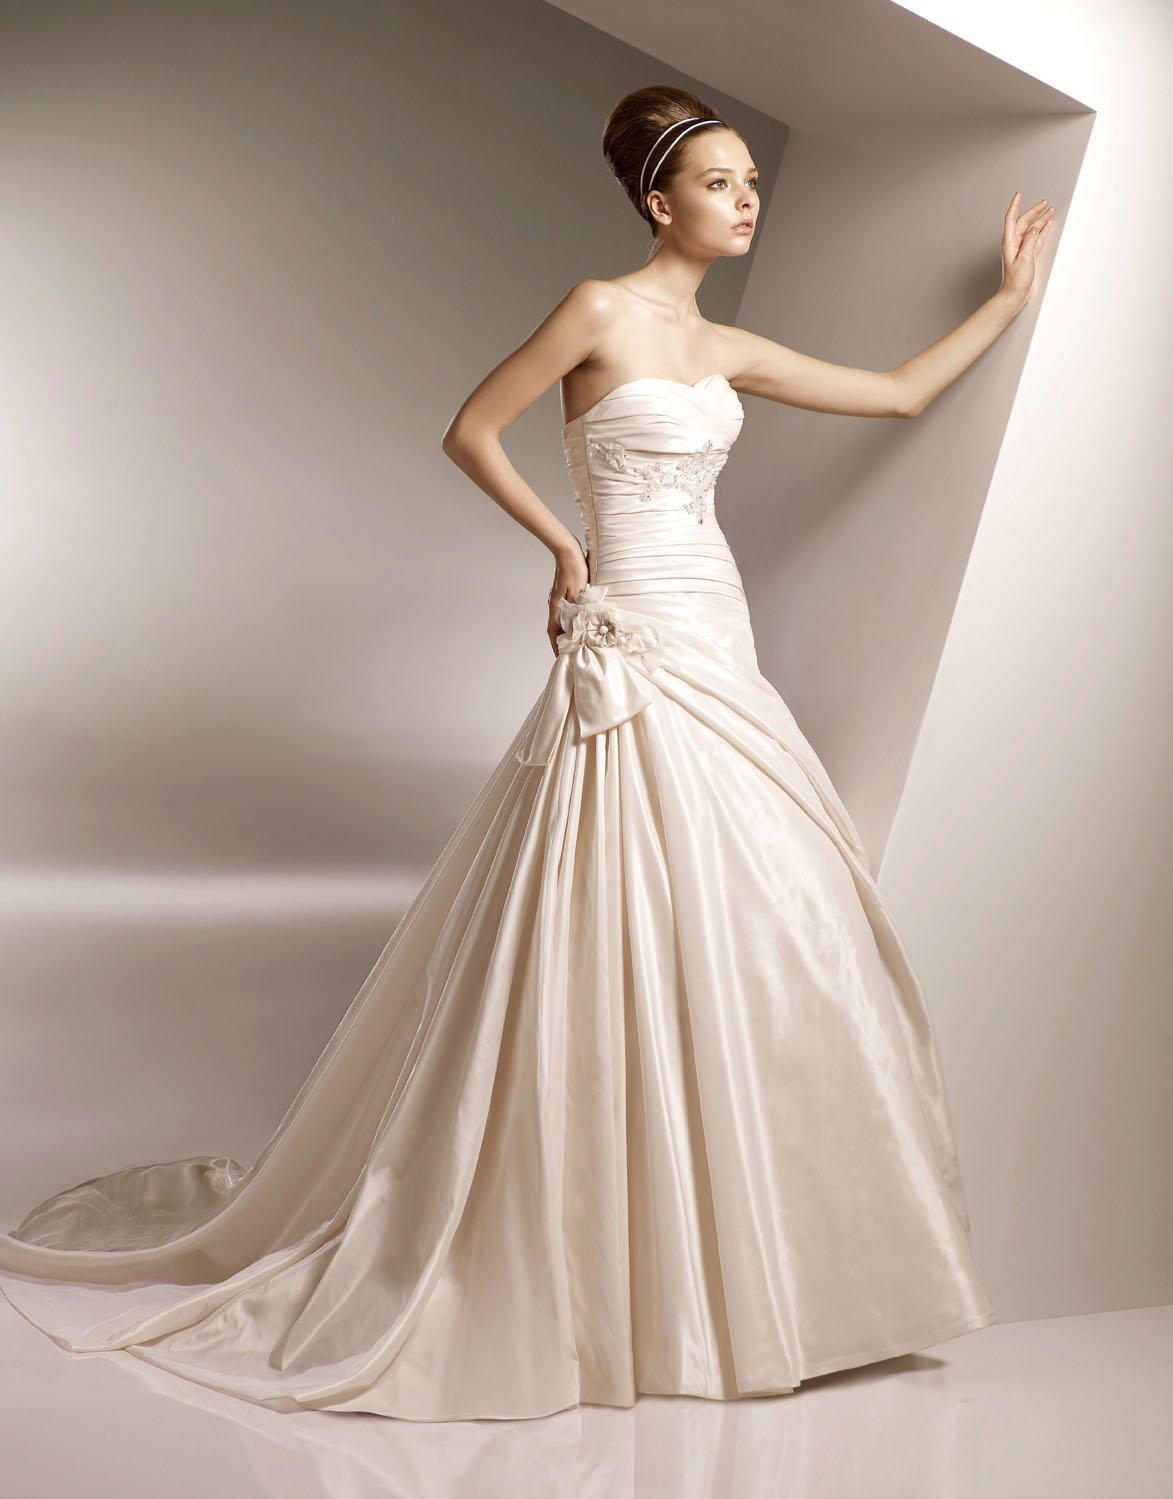 Sweetheart Appliqued Beading Taffeta Wedding Dress Bridal Gown